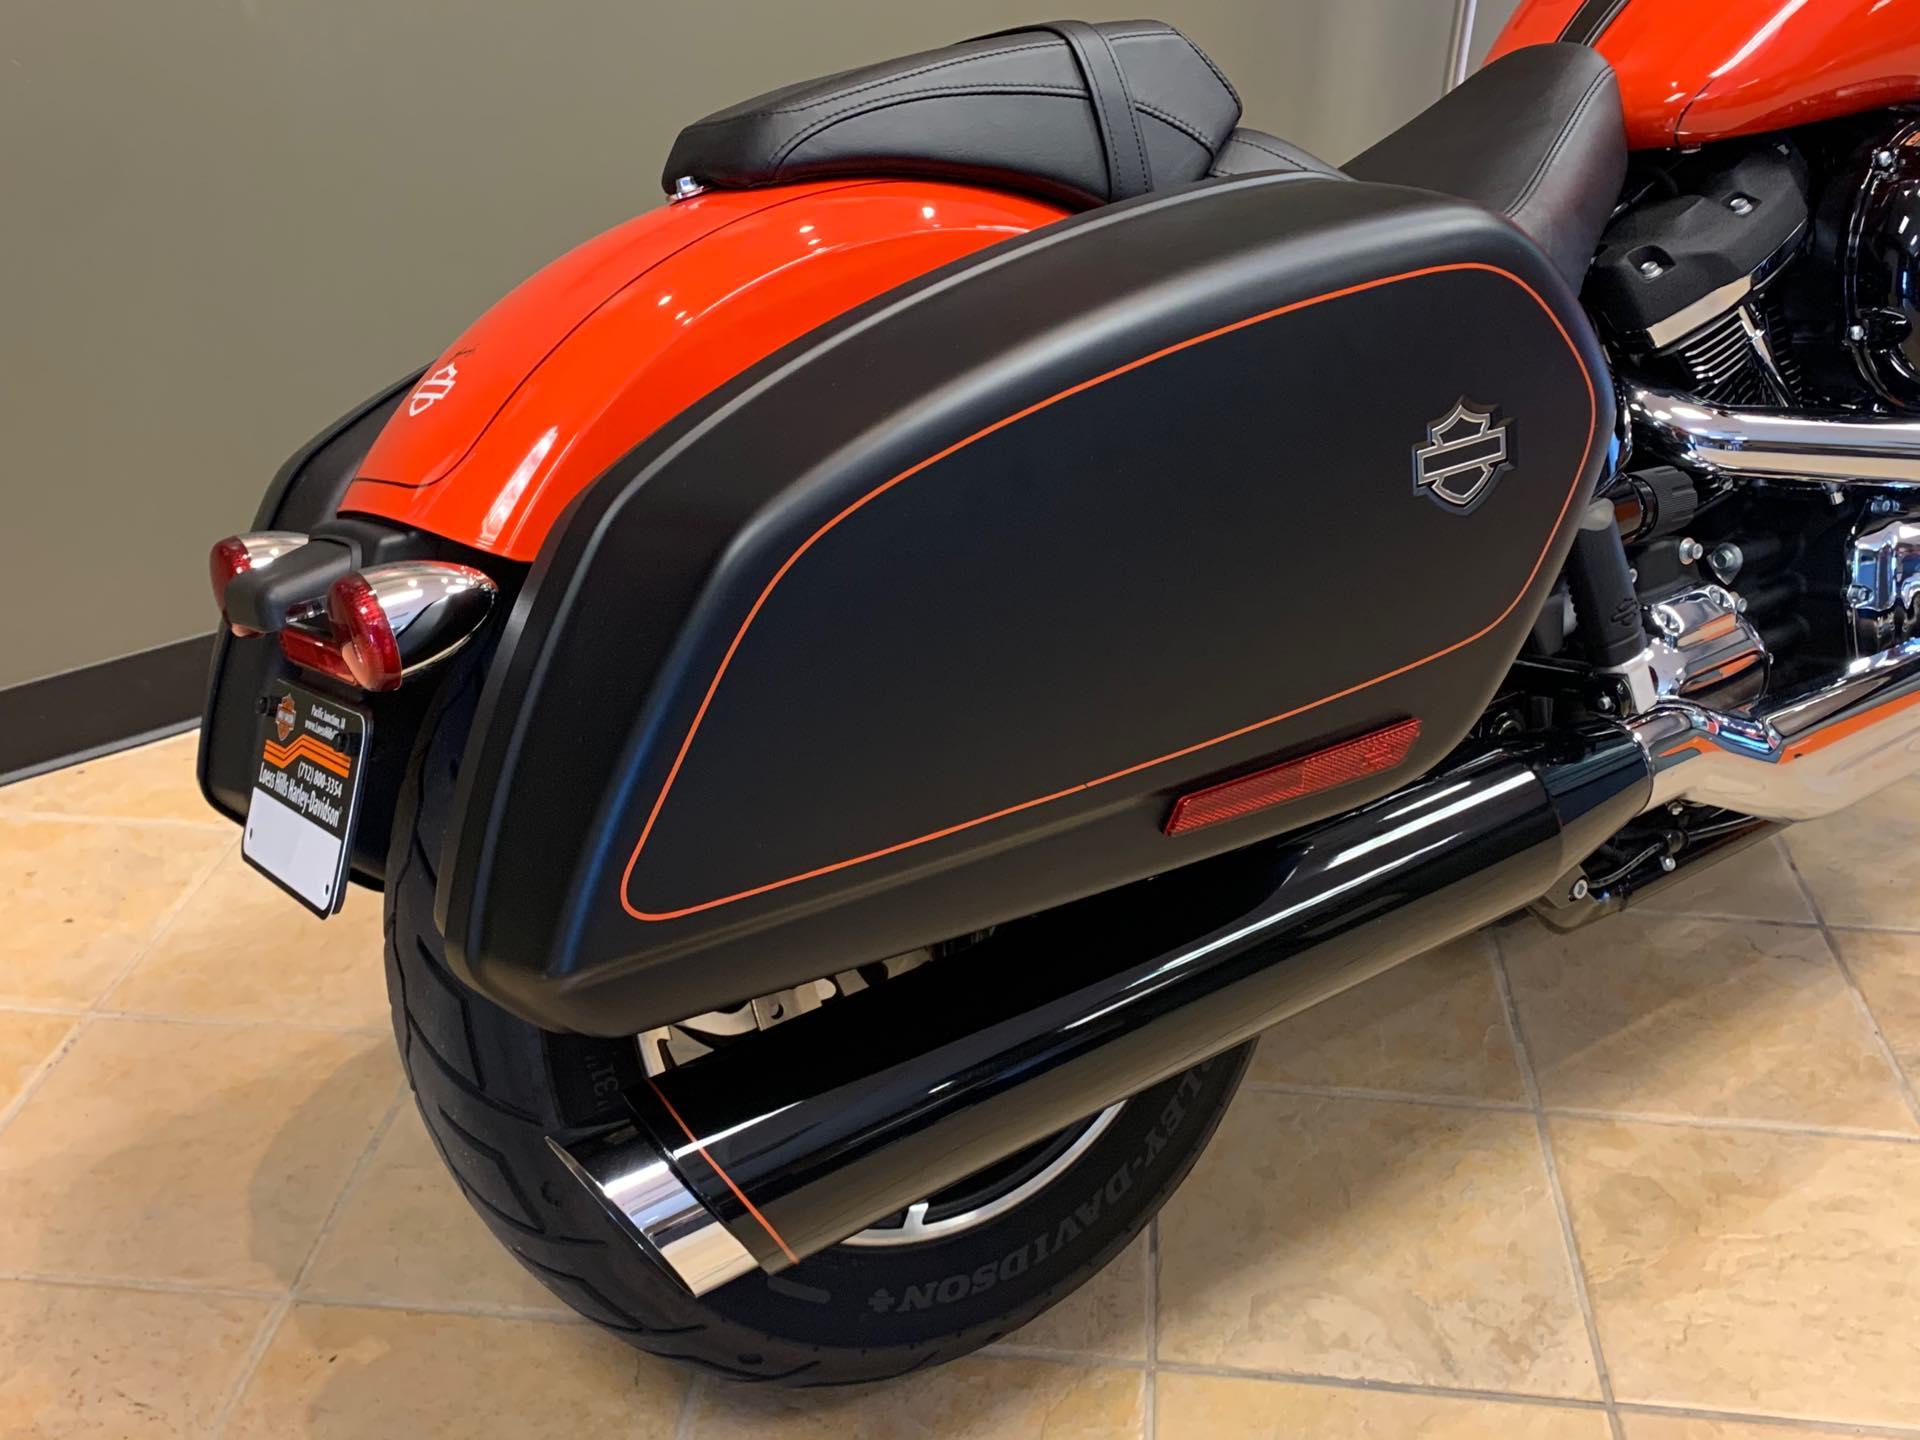 2020 Harley-Davidson Softail Sport Glide at Loess Hills Harley-Davidson